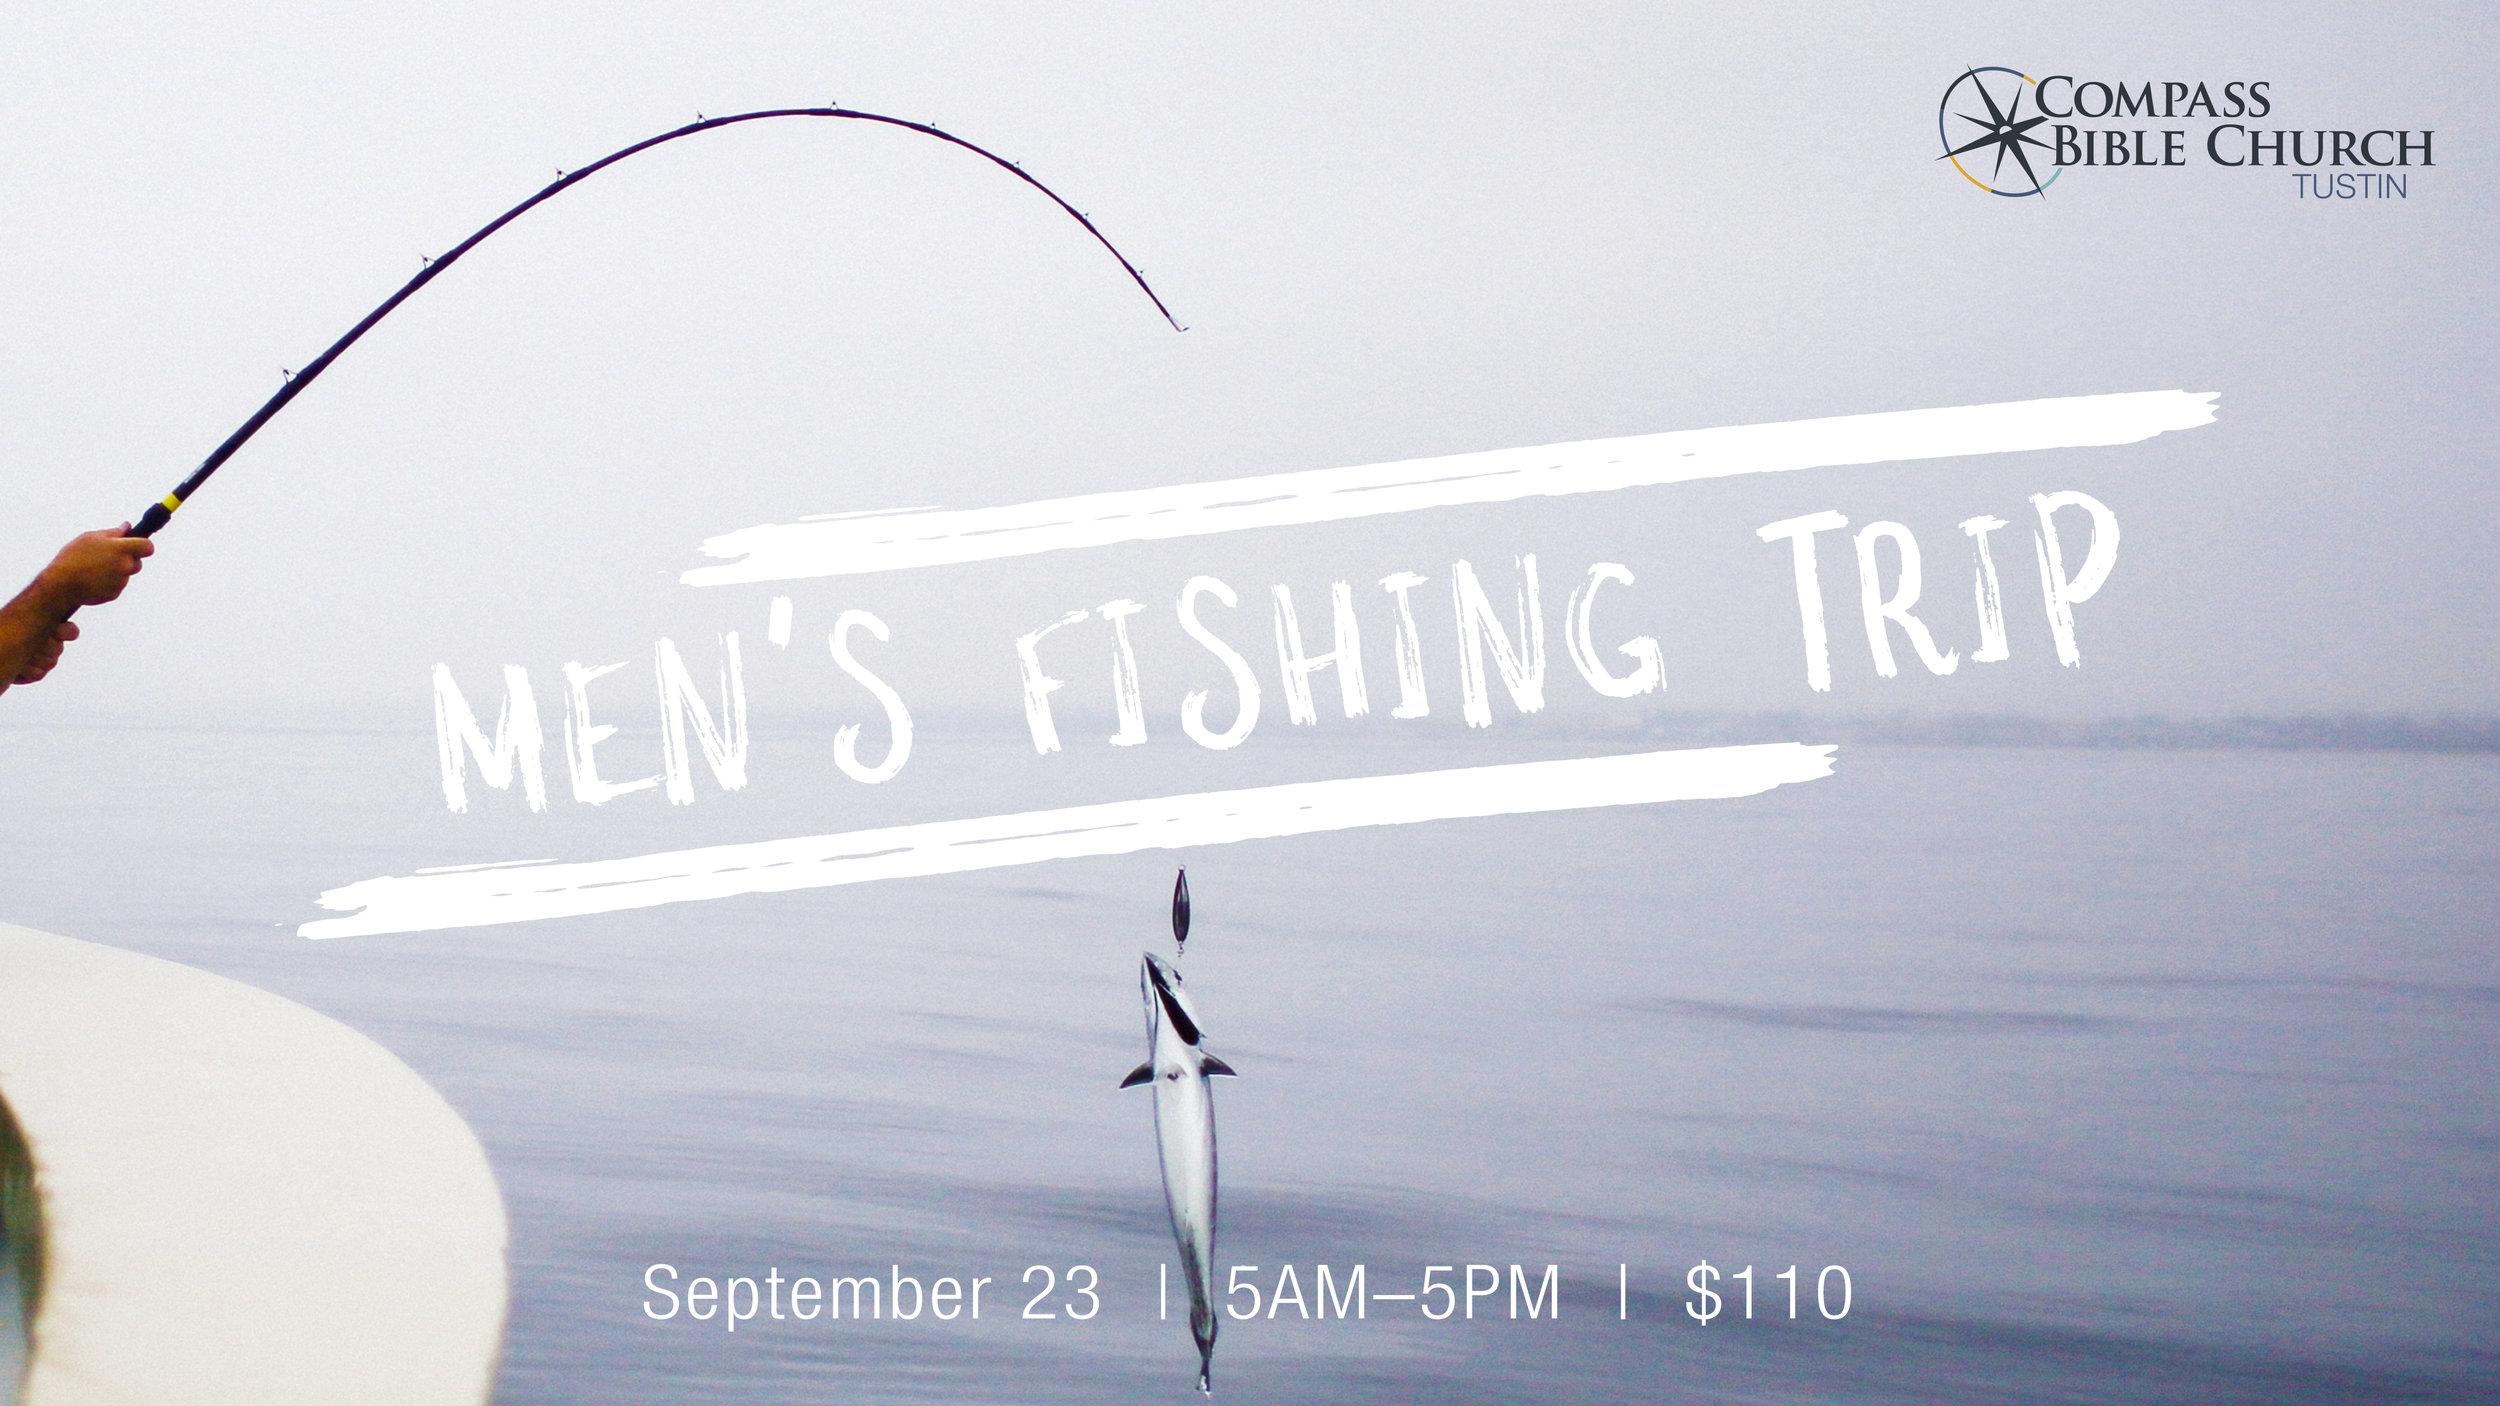 fishingtrip2020slide.jpg